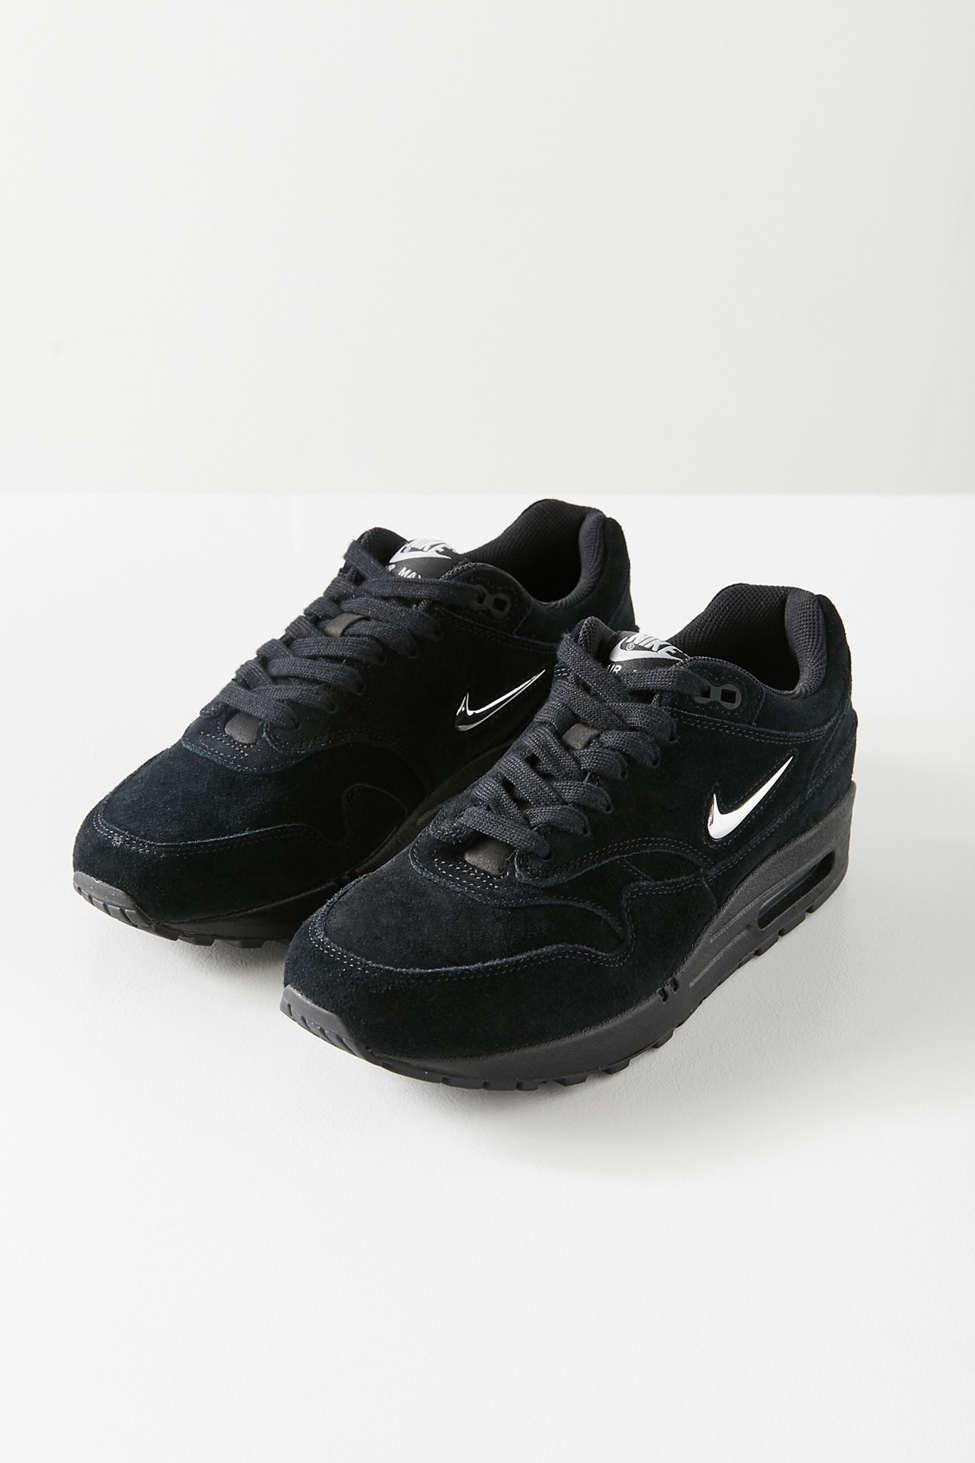 nike air max 1 premio urban outfitters di scarpe da ginnastica.